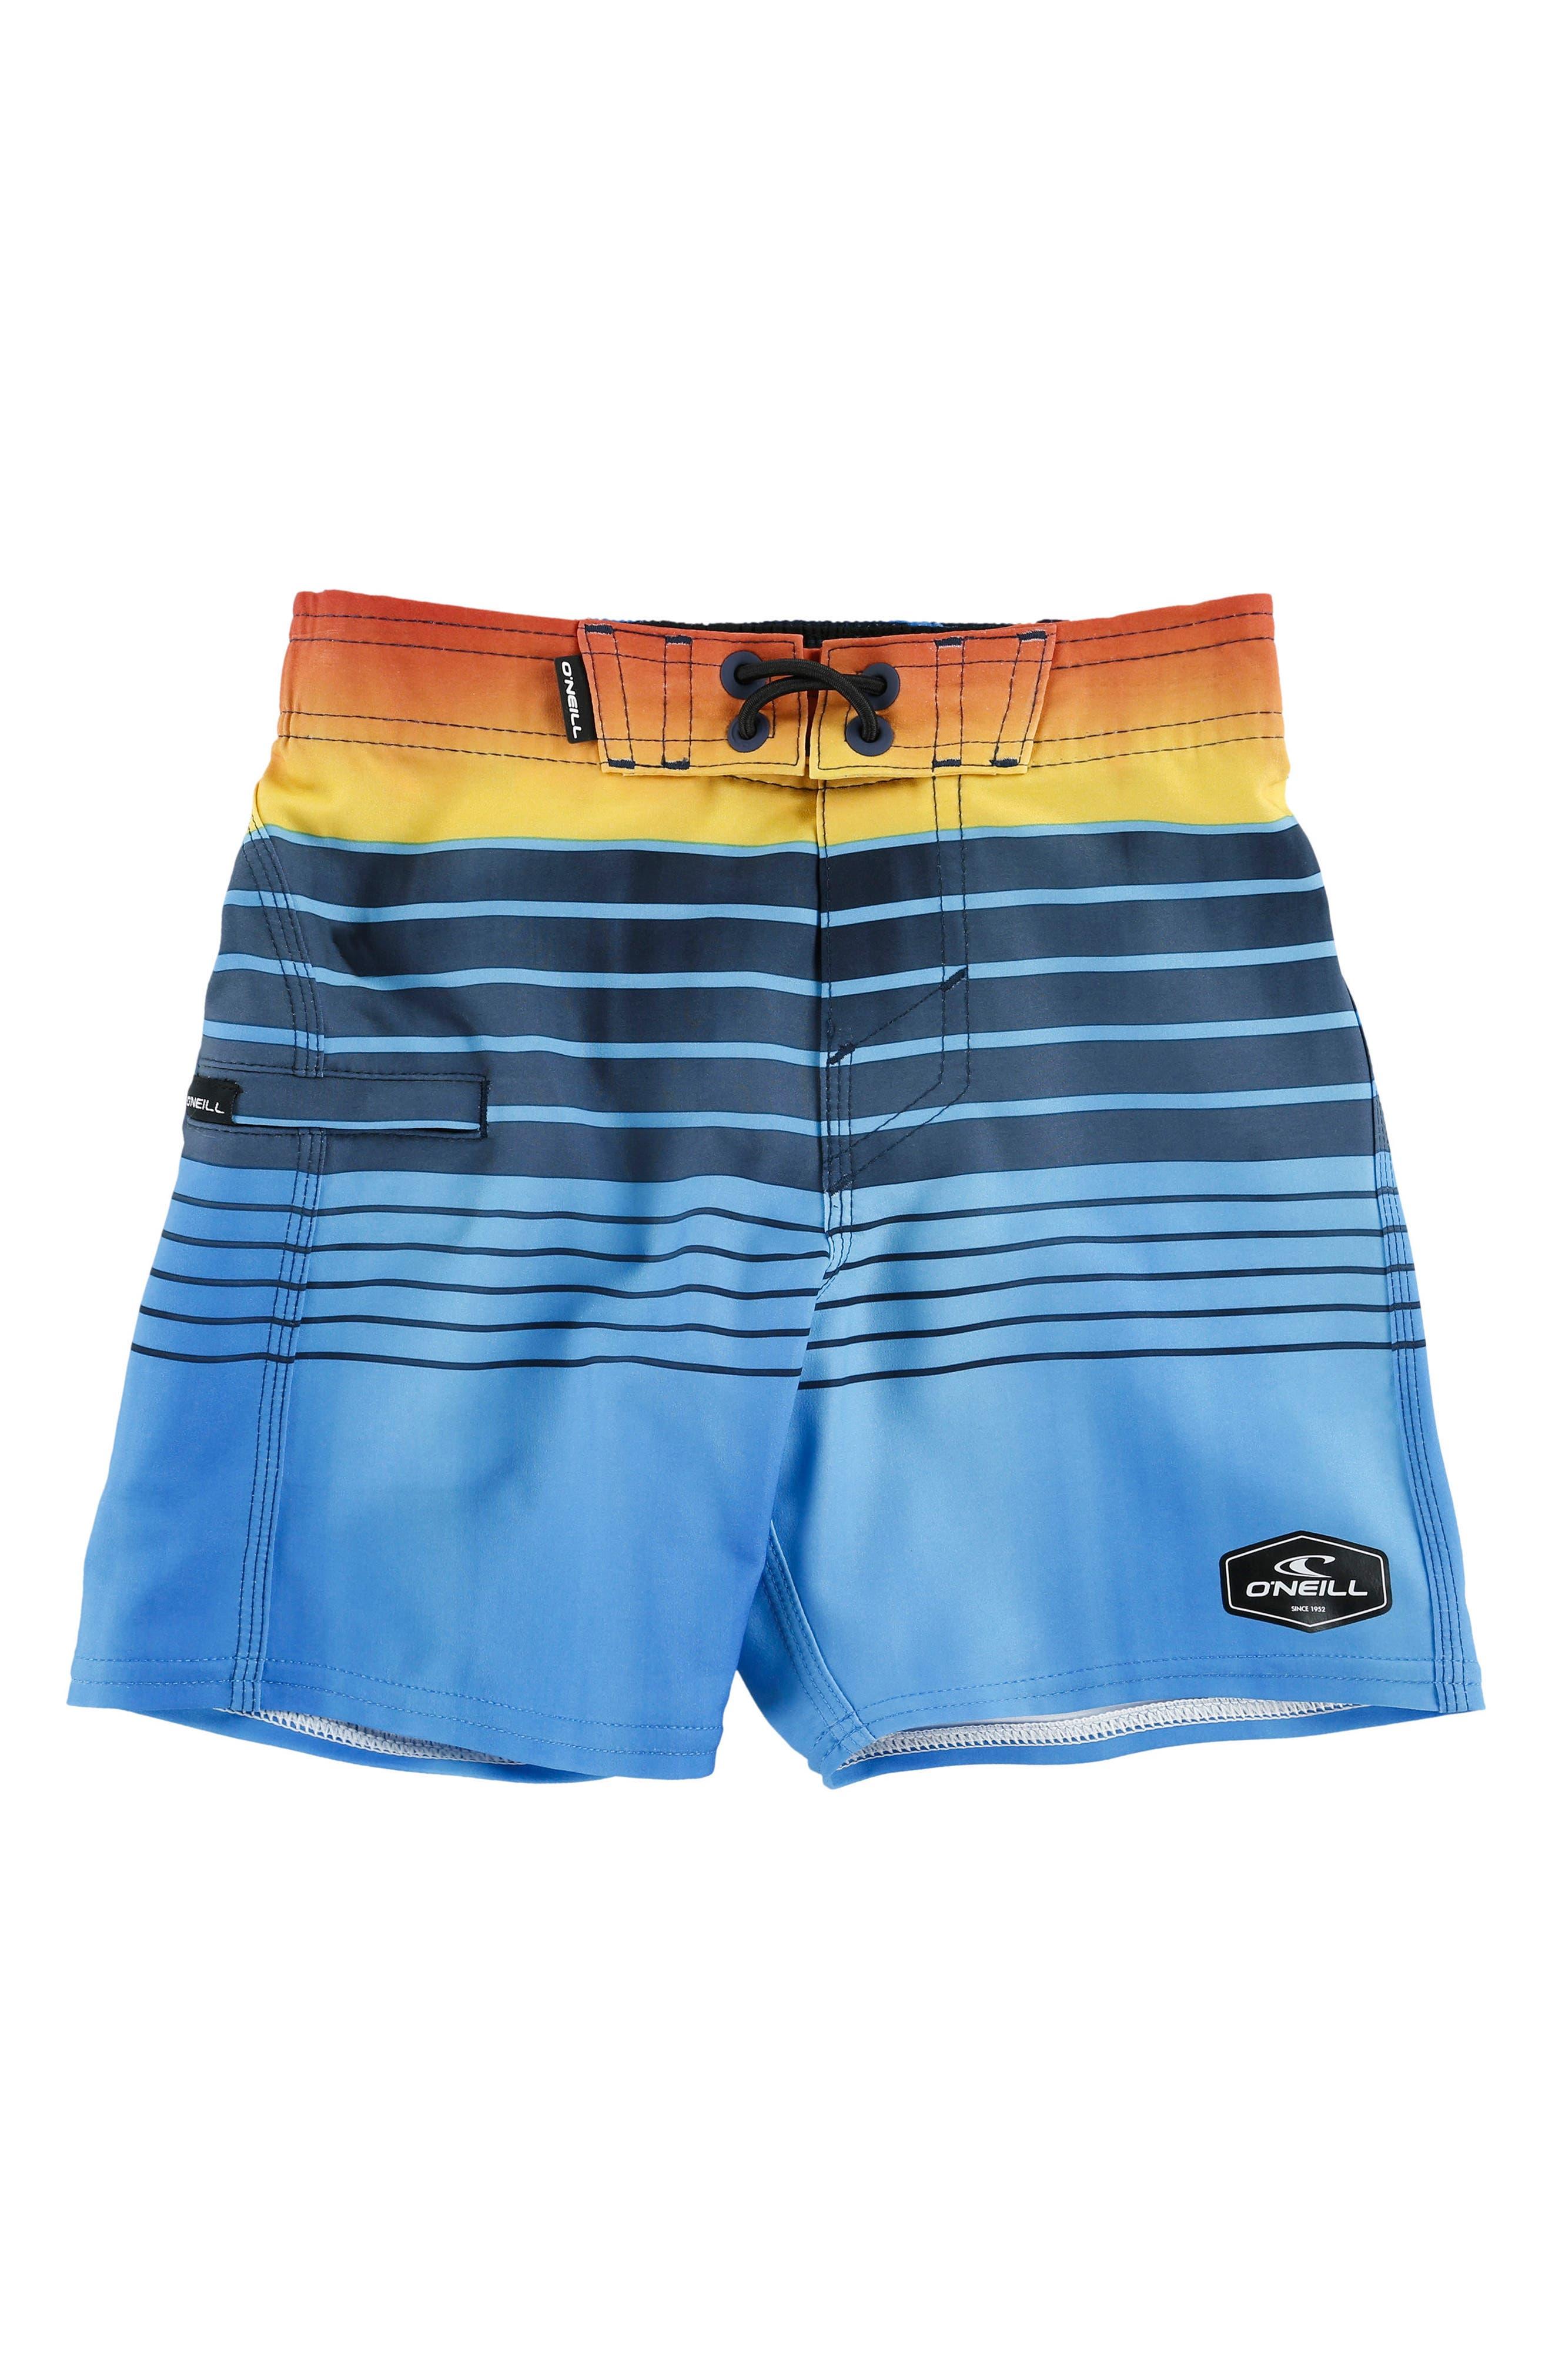 Hyperfreak Heist Board Shorts,                         Main,                         color, Blue